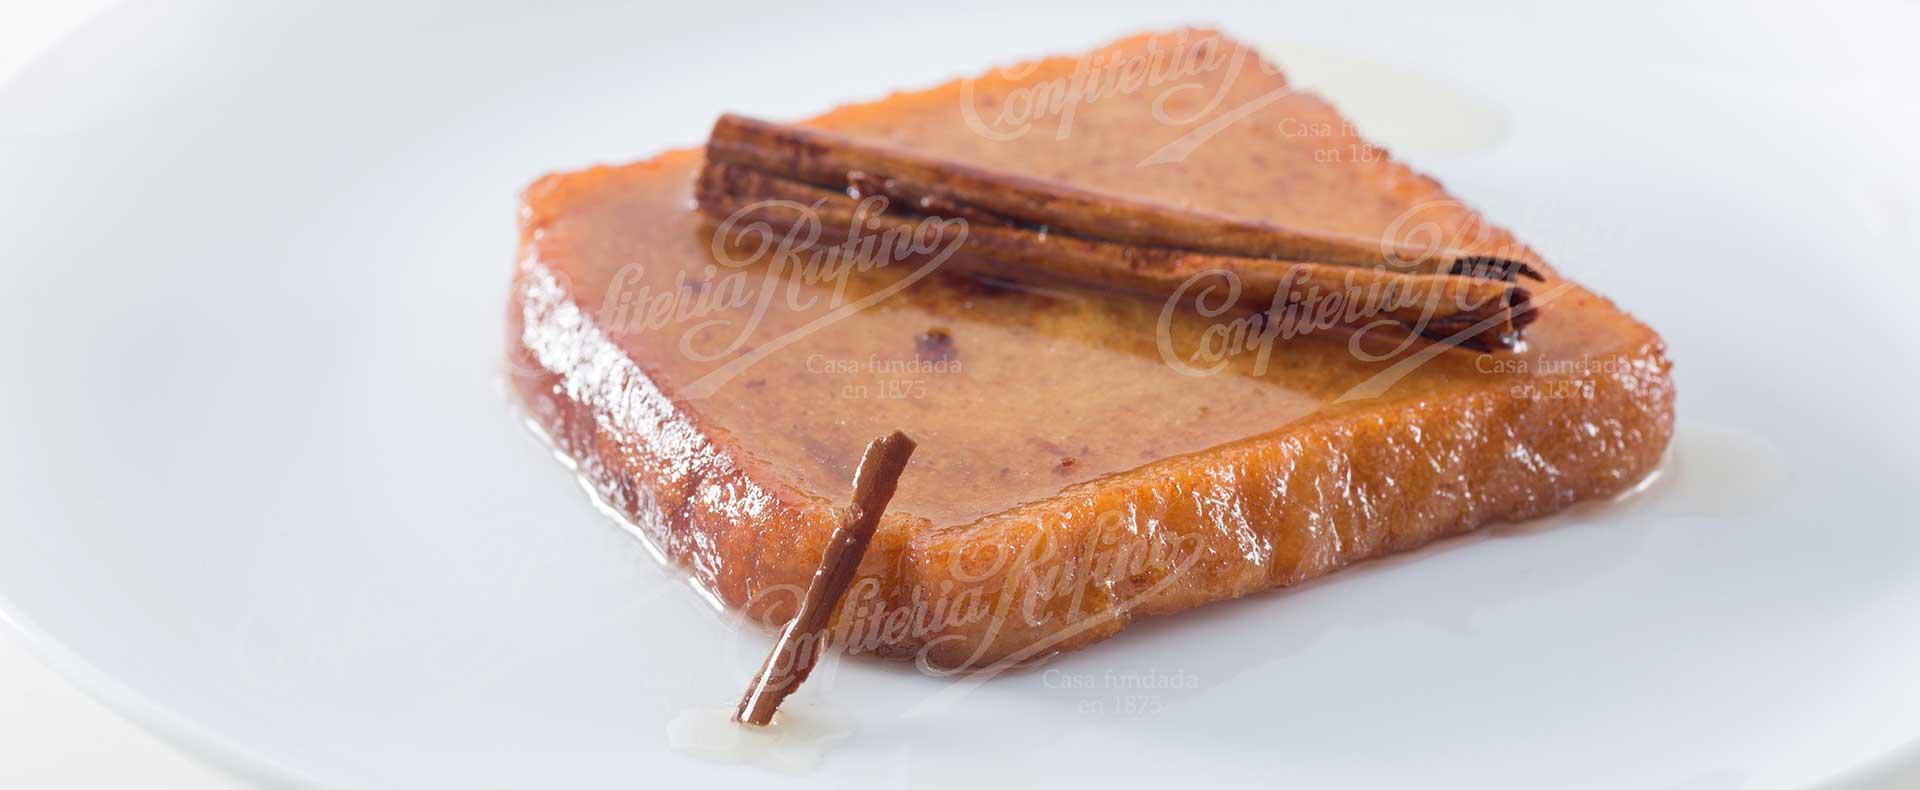 Torrija dulce frito de Semana Santa Confiteria Rufino Aracena